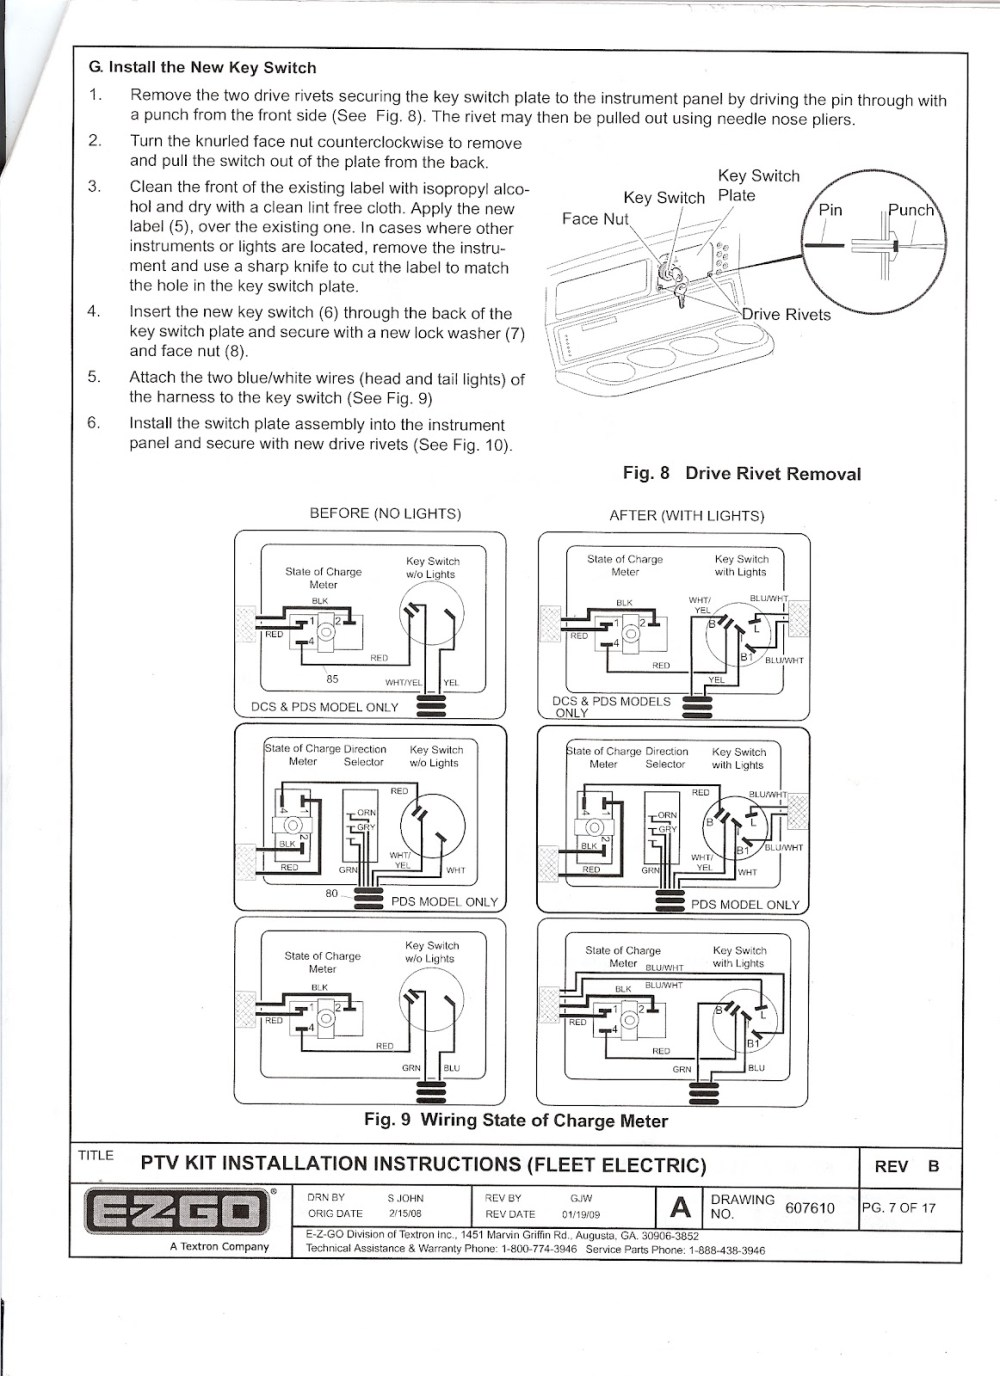 medium resolution of ezgo wiring dia routenew mx tl evinrude sportwin evinrude 2 mate 1974 diagramquot quot1998 60 hp evinrude